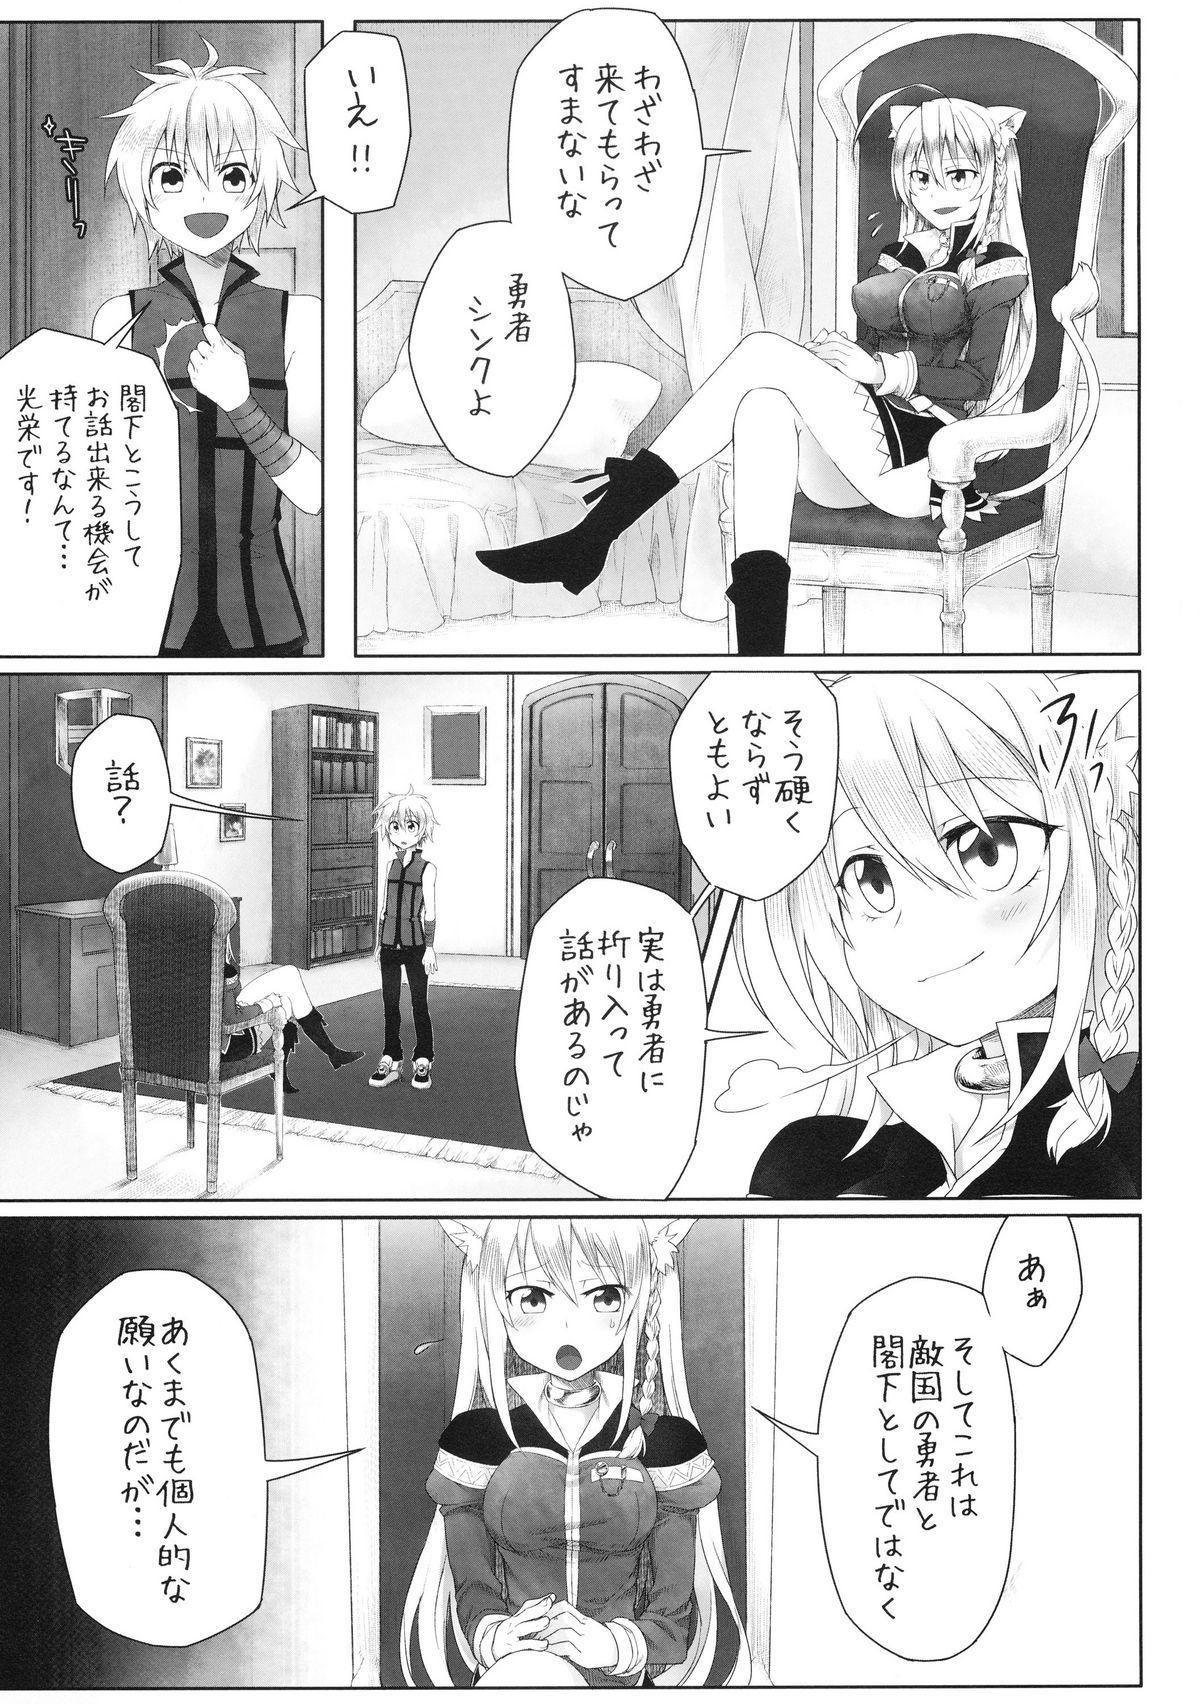 Hatsujou! Neko Hime Choukyou Sen!? 2